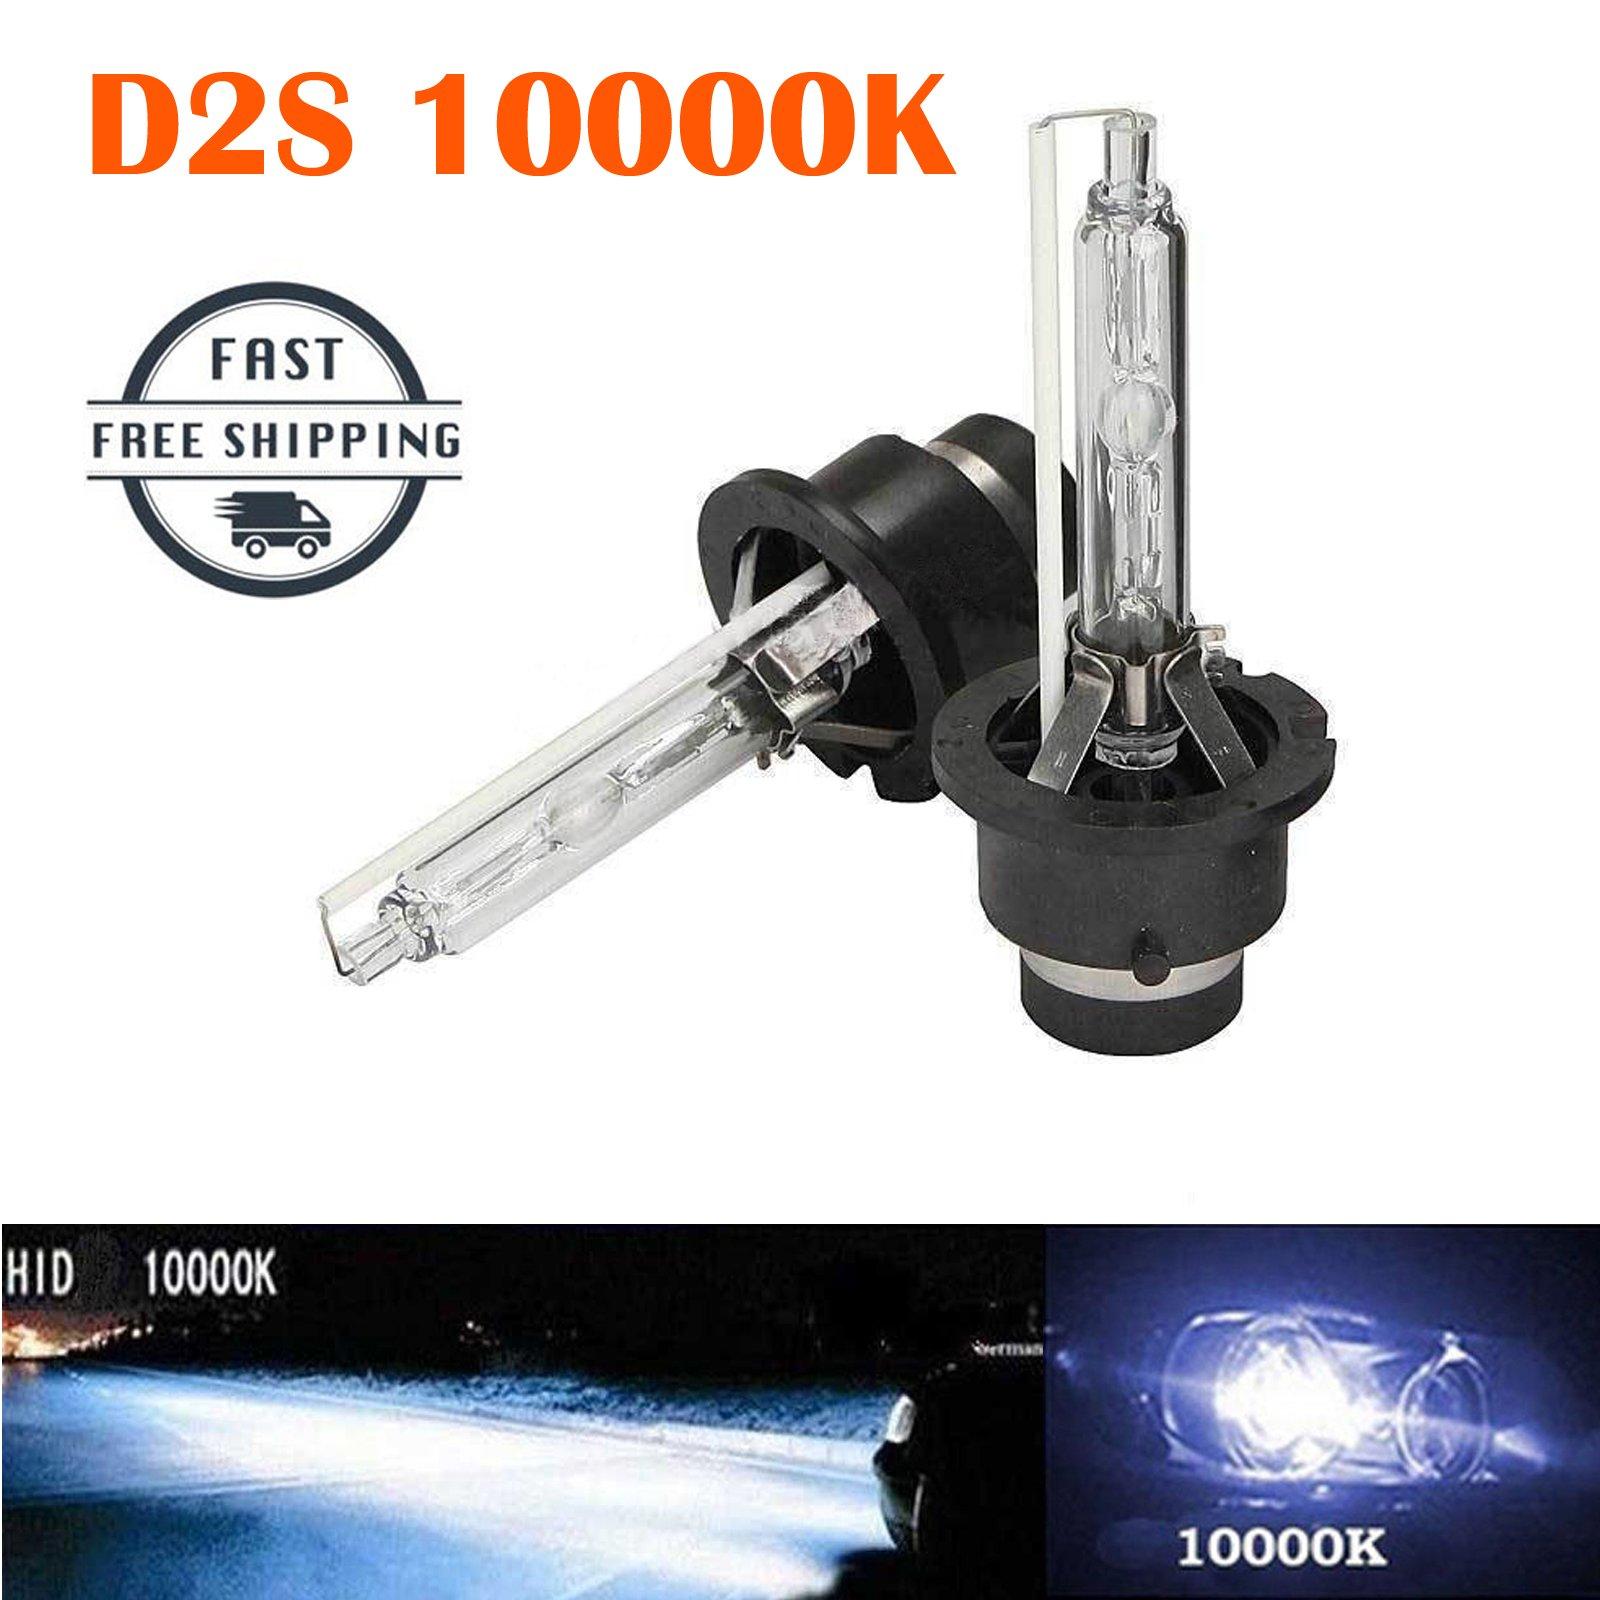 D2S D2C D2R 10000K HID Bulbs Xenon 35W 12V Car Headlight Deep Blue Color Replacement 85122 85123 66040 53500 (Pair)